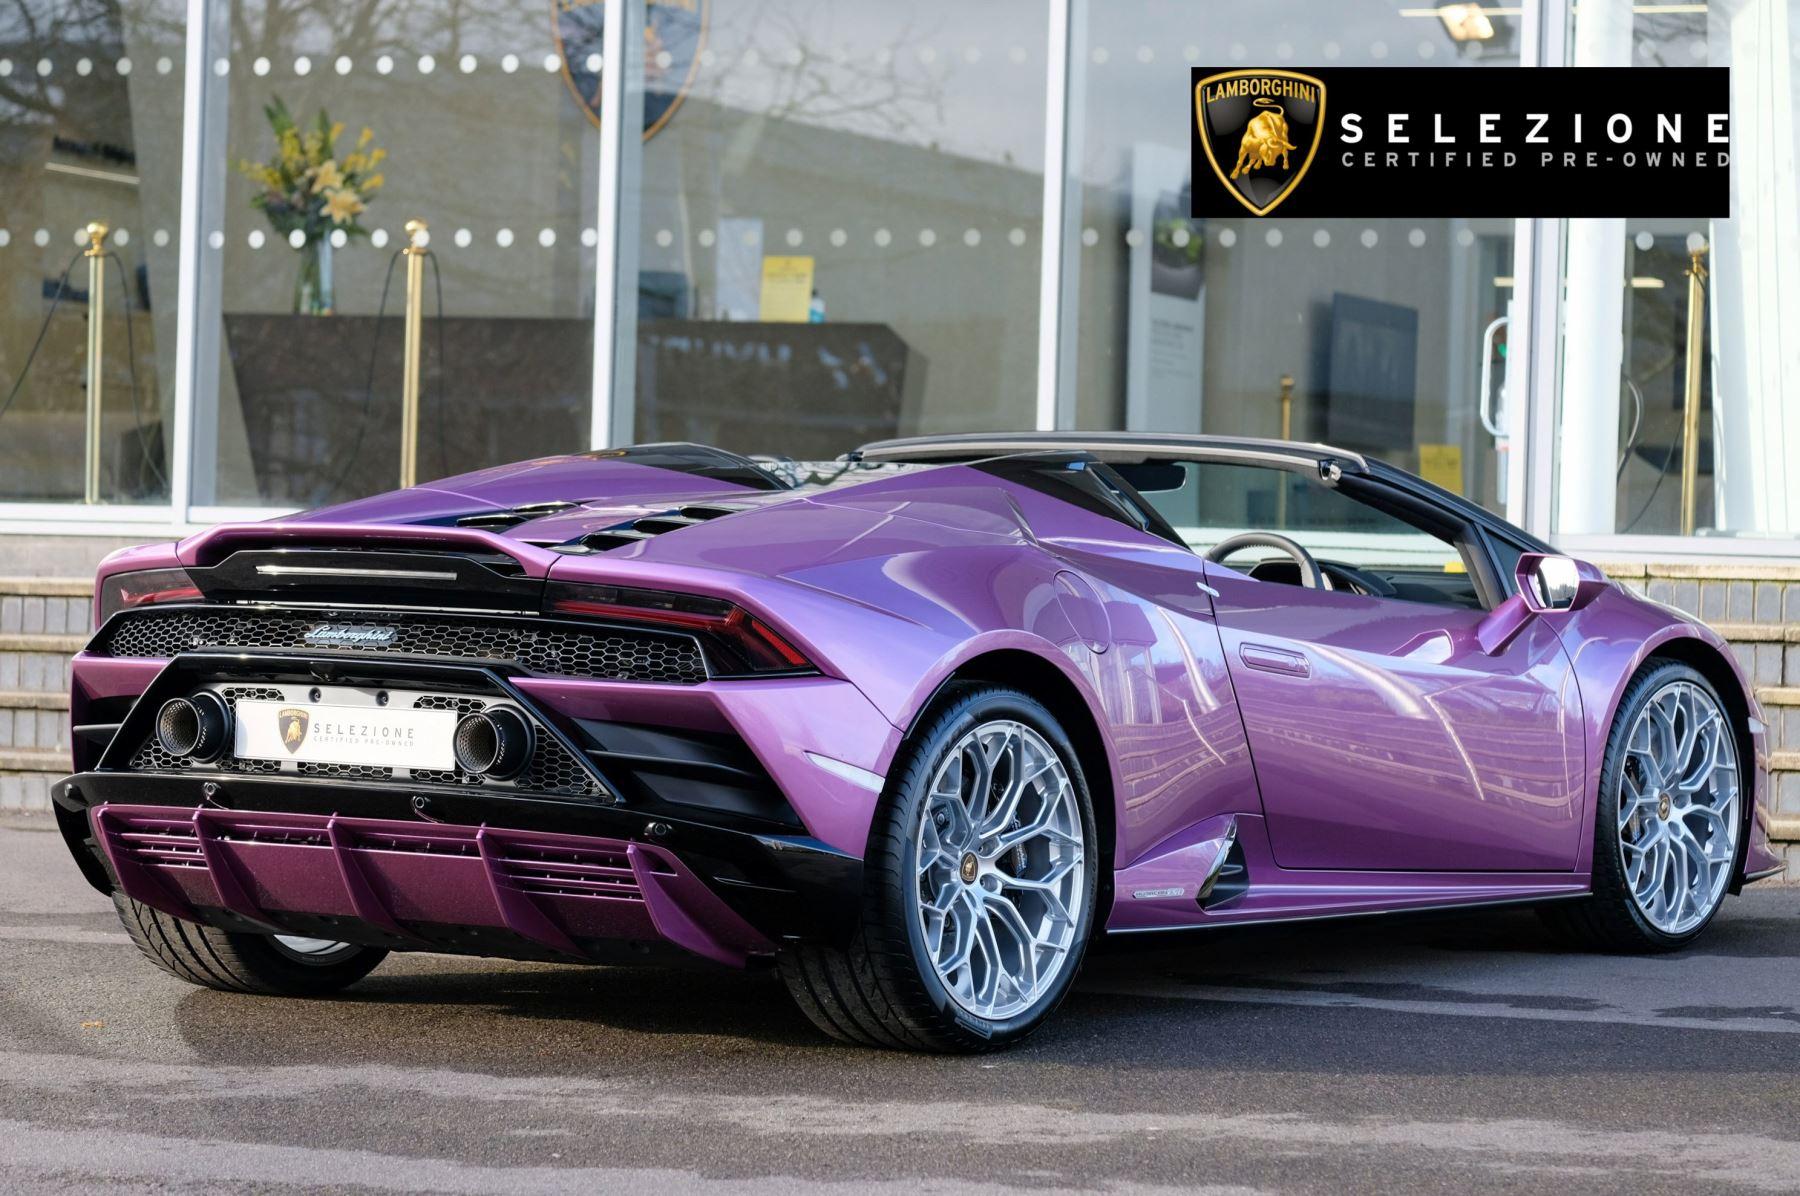 Lamborghini Huracan EVO Spyder 5.2 V10 640 2dr Auto AWD image 3